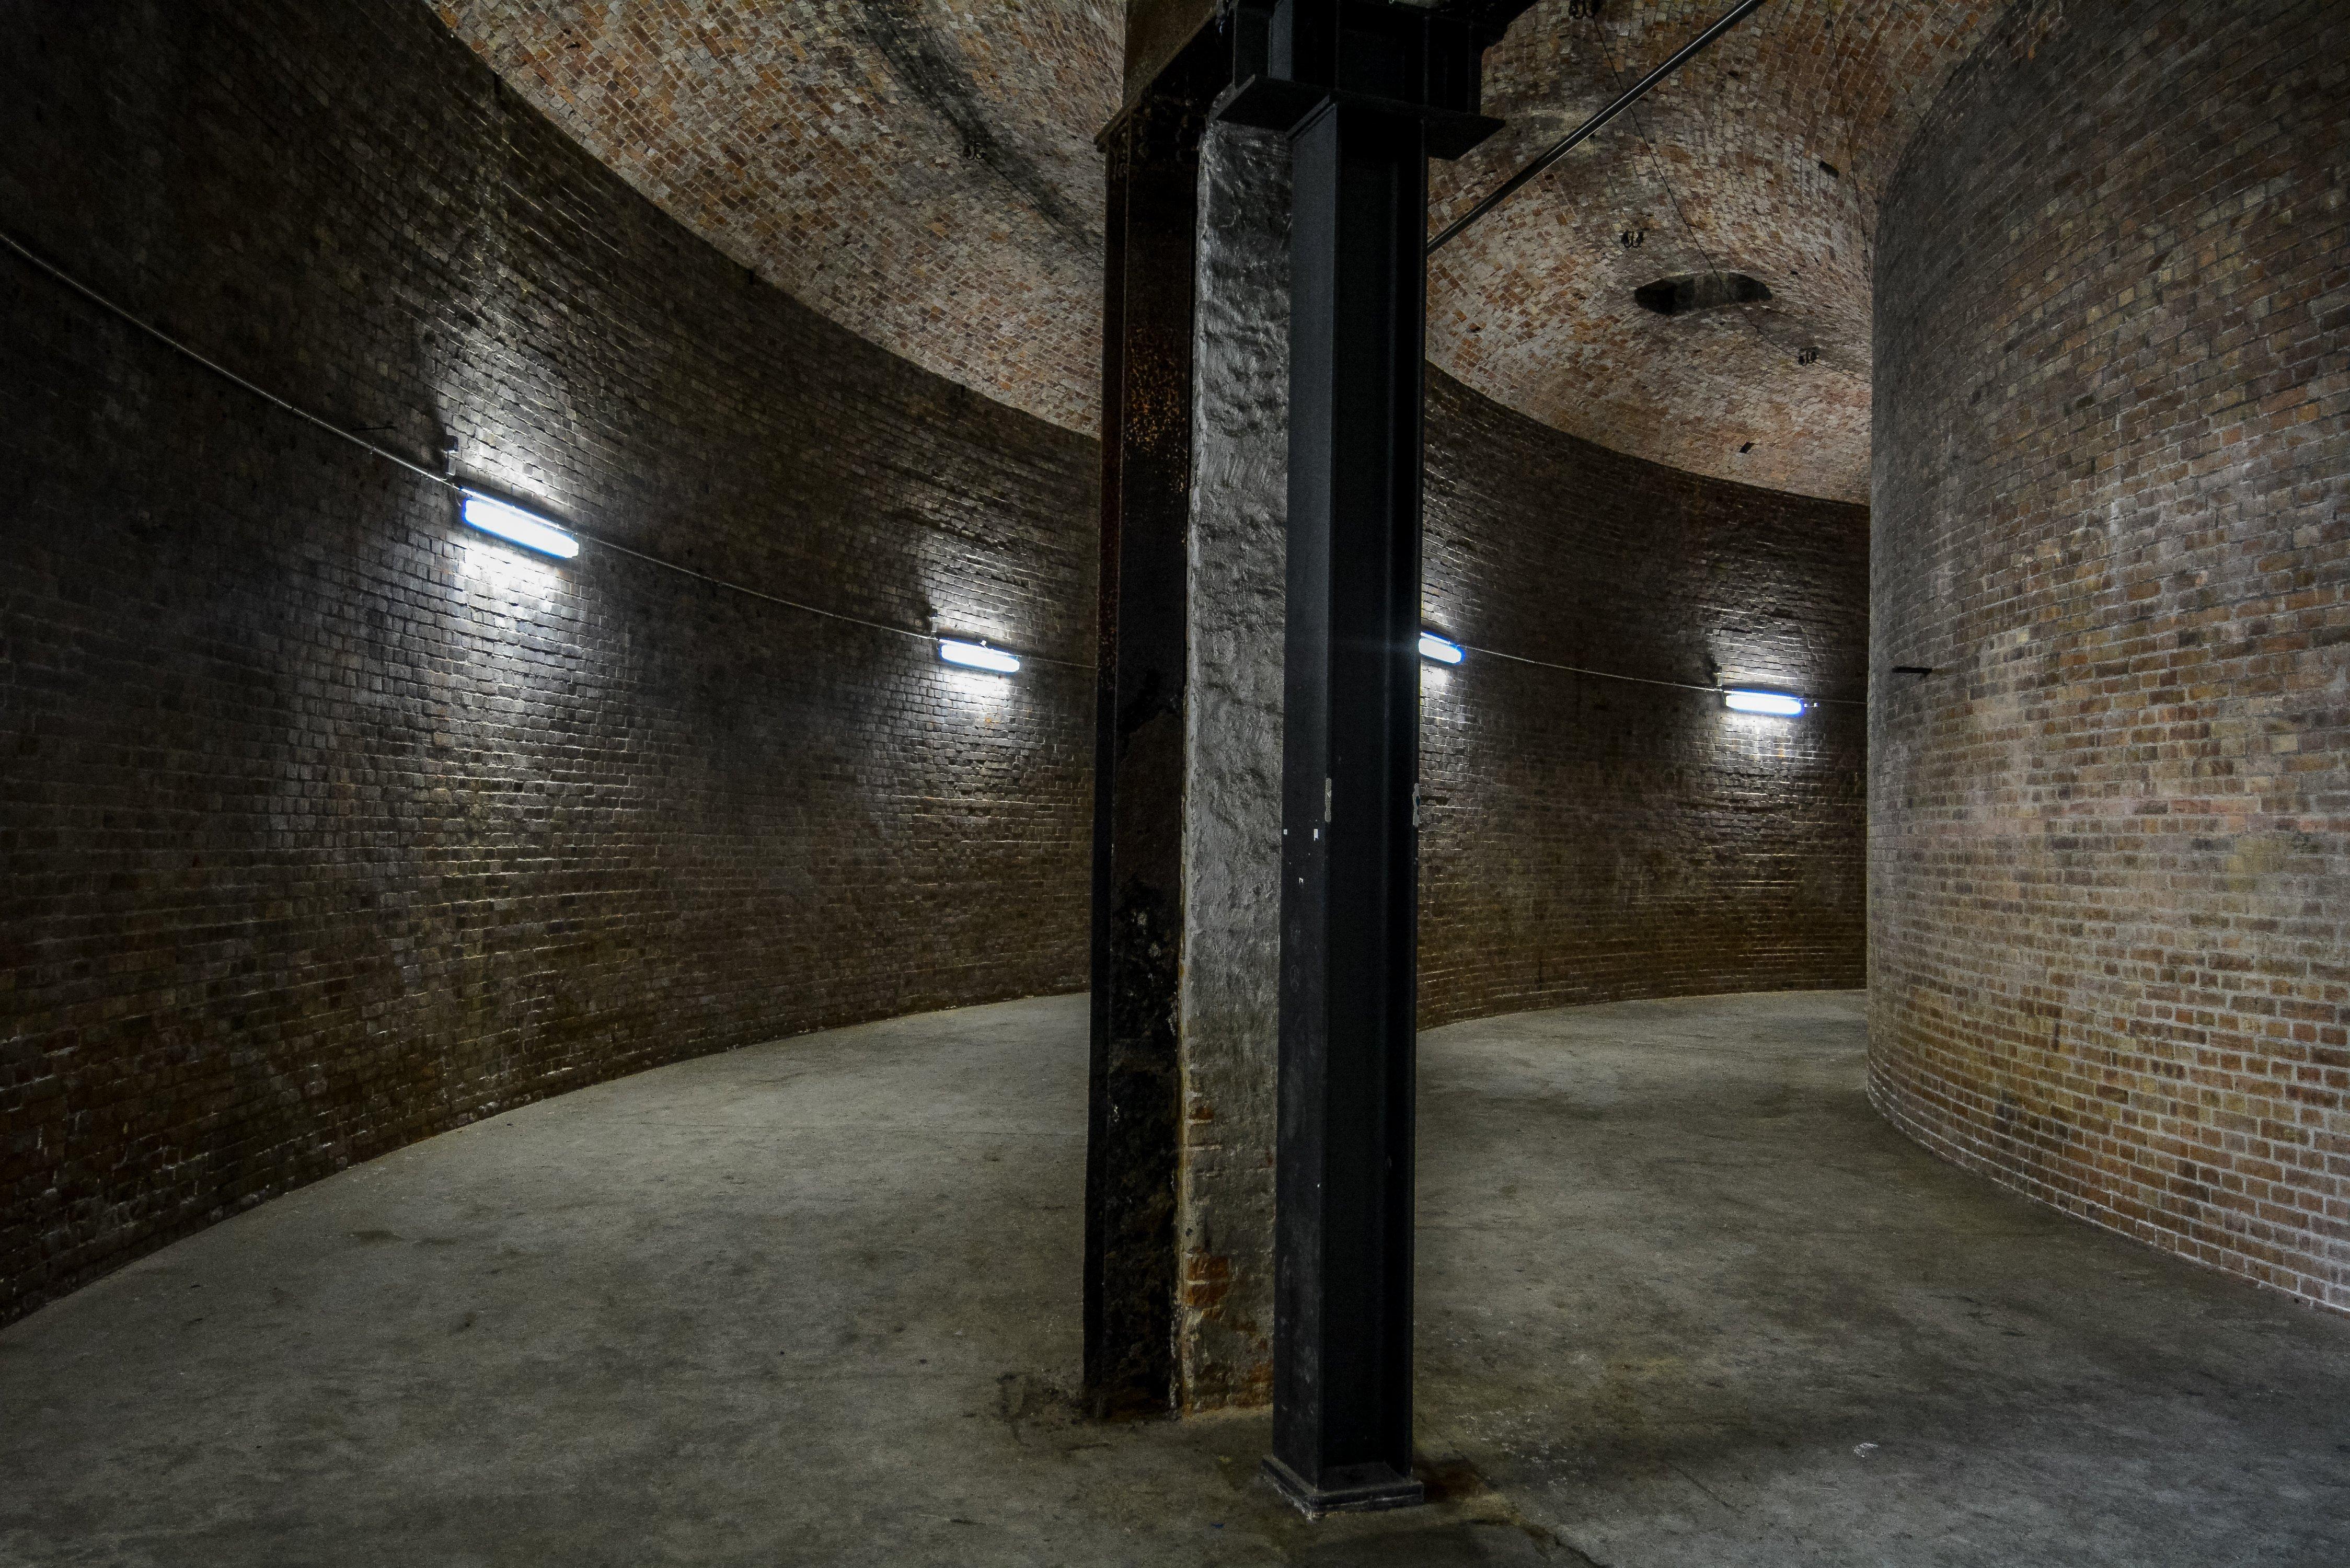 berlin prenzlauer berg wasserturm water tower large water reservoir interior inner ring wall